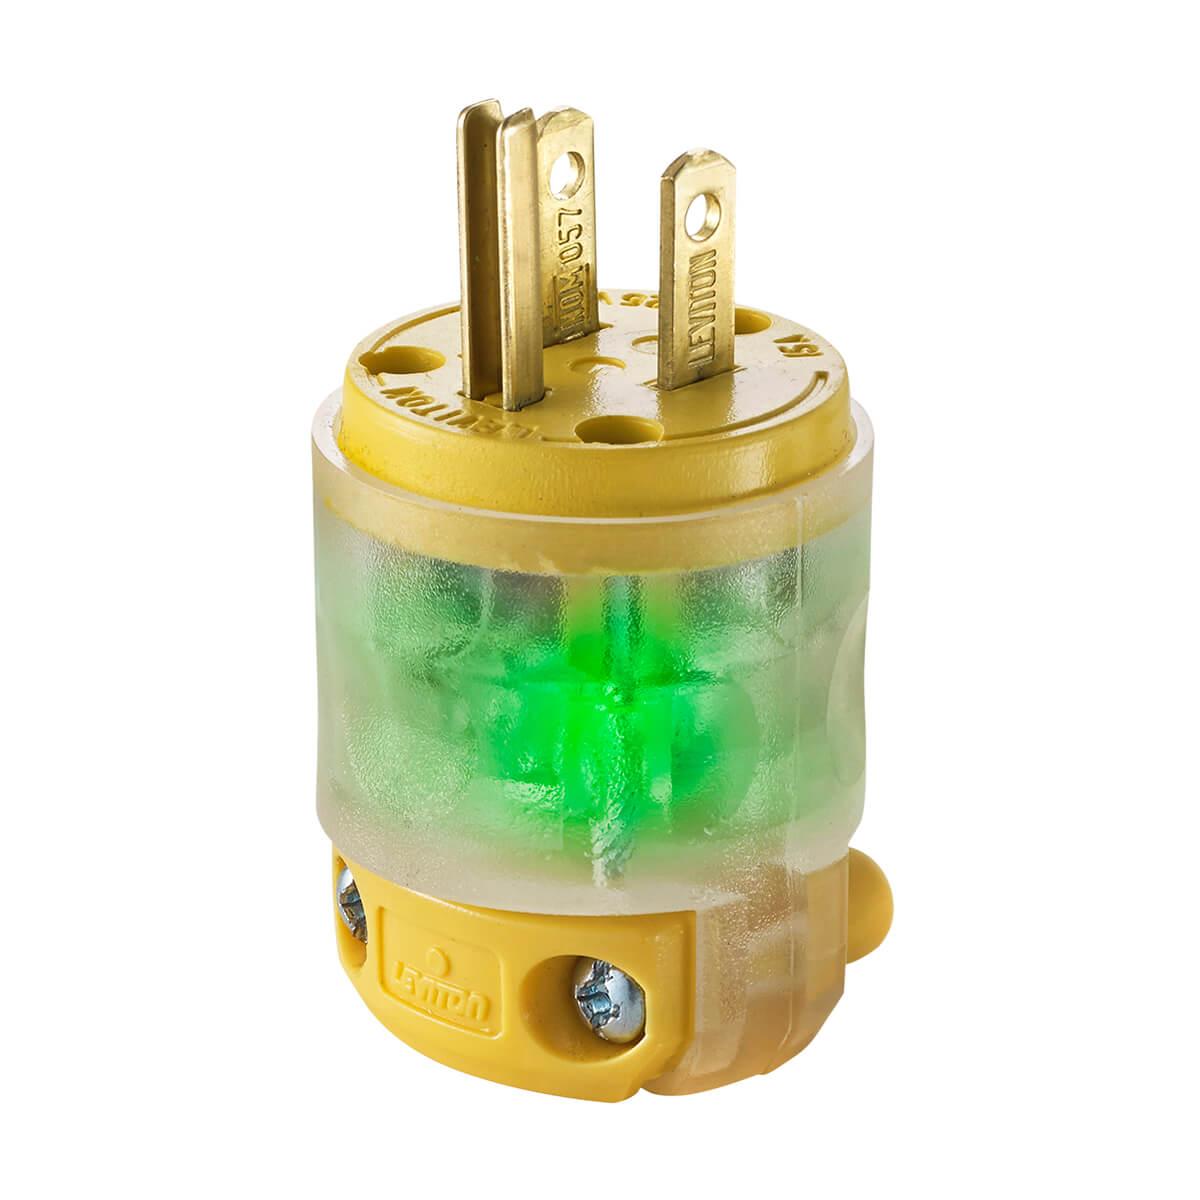 Leviton® 15 Amp Straight Blade 3-Wire Plug